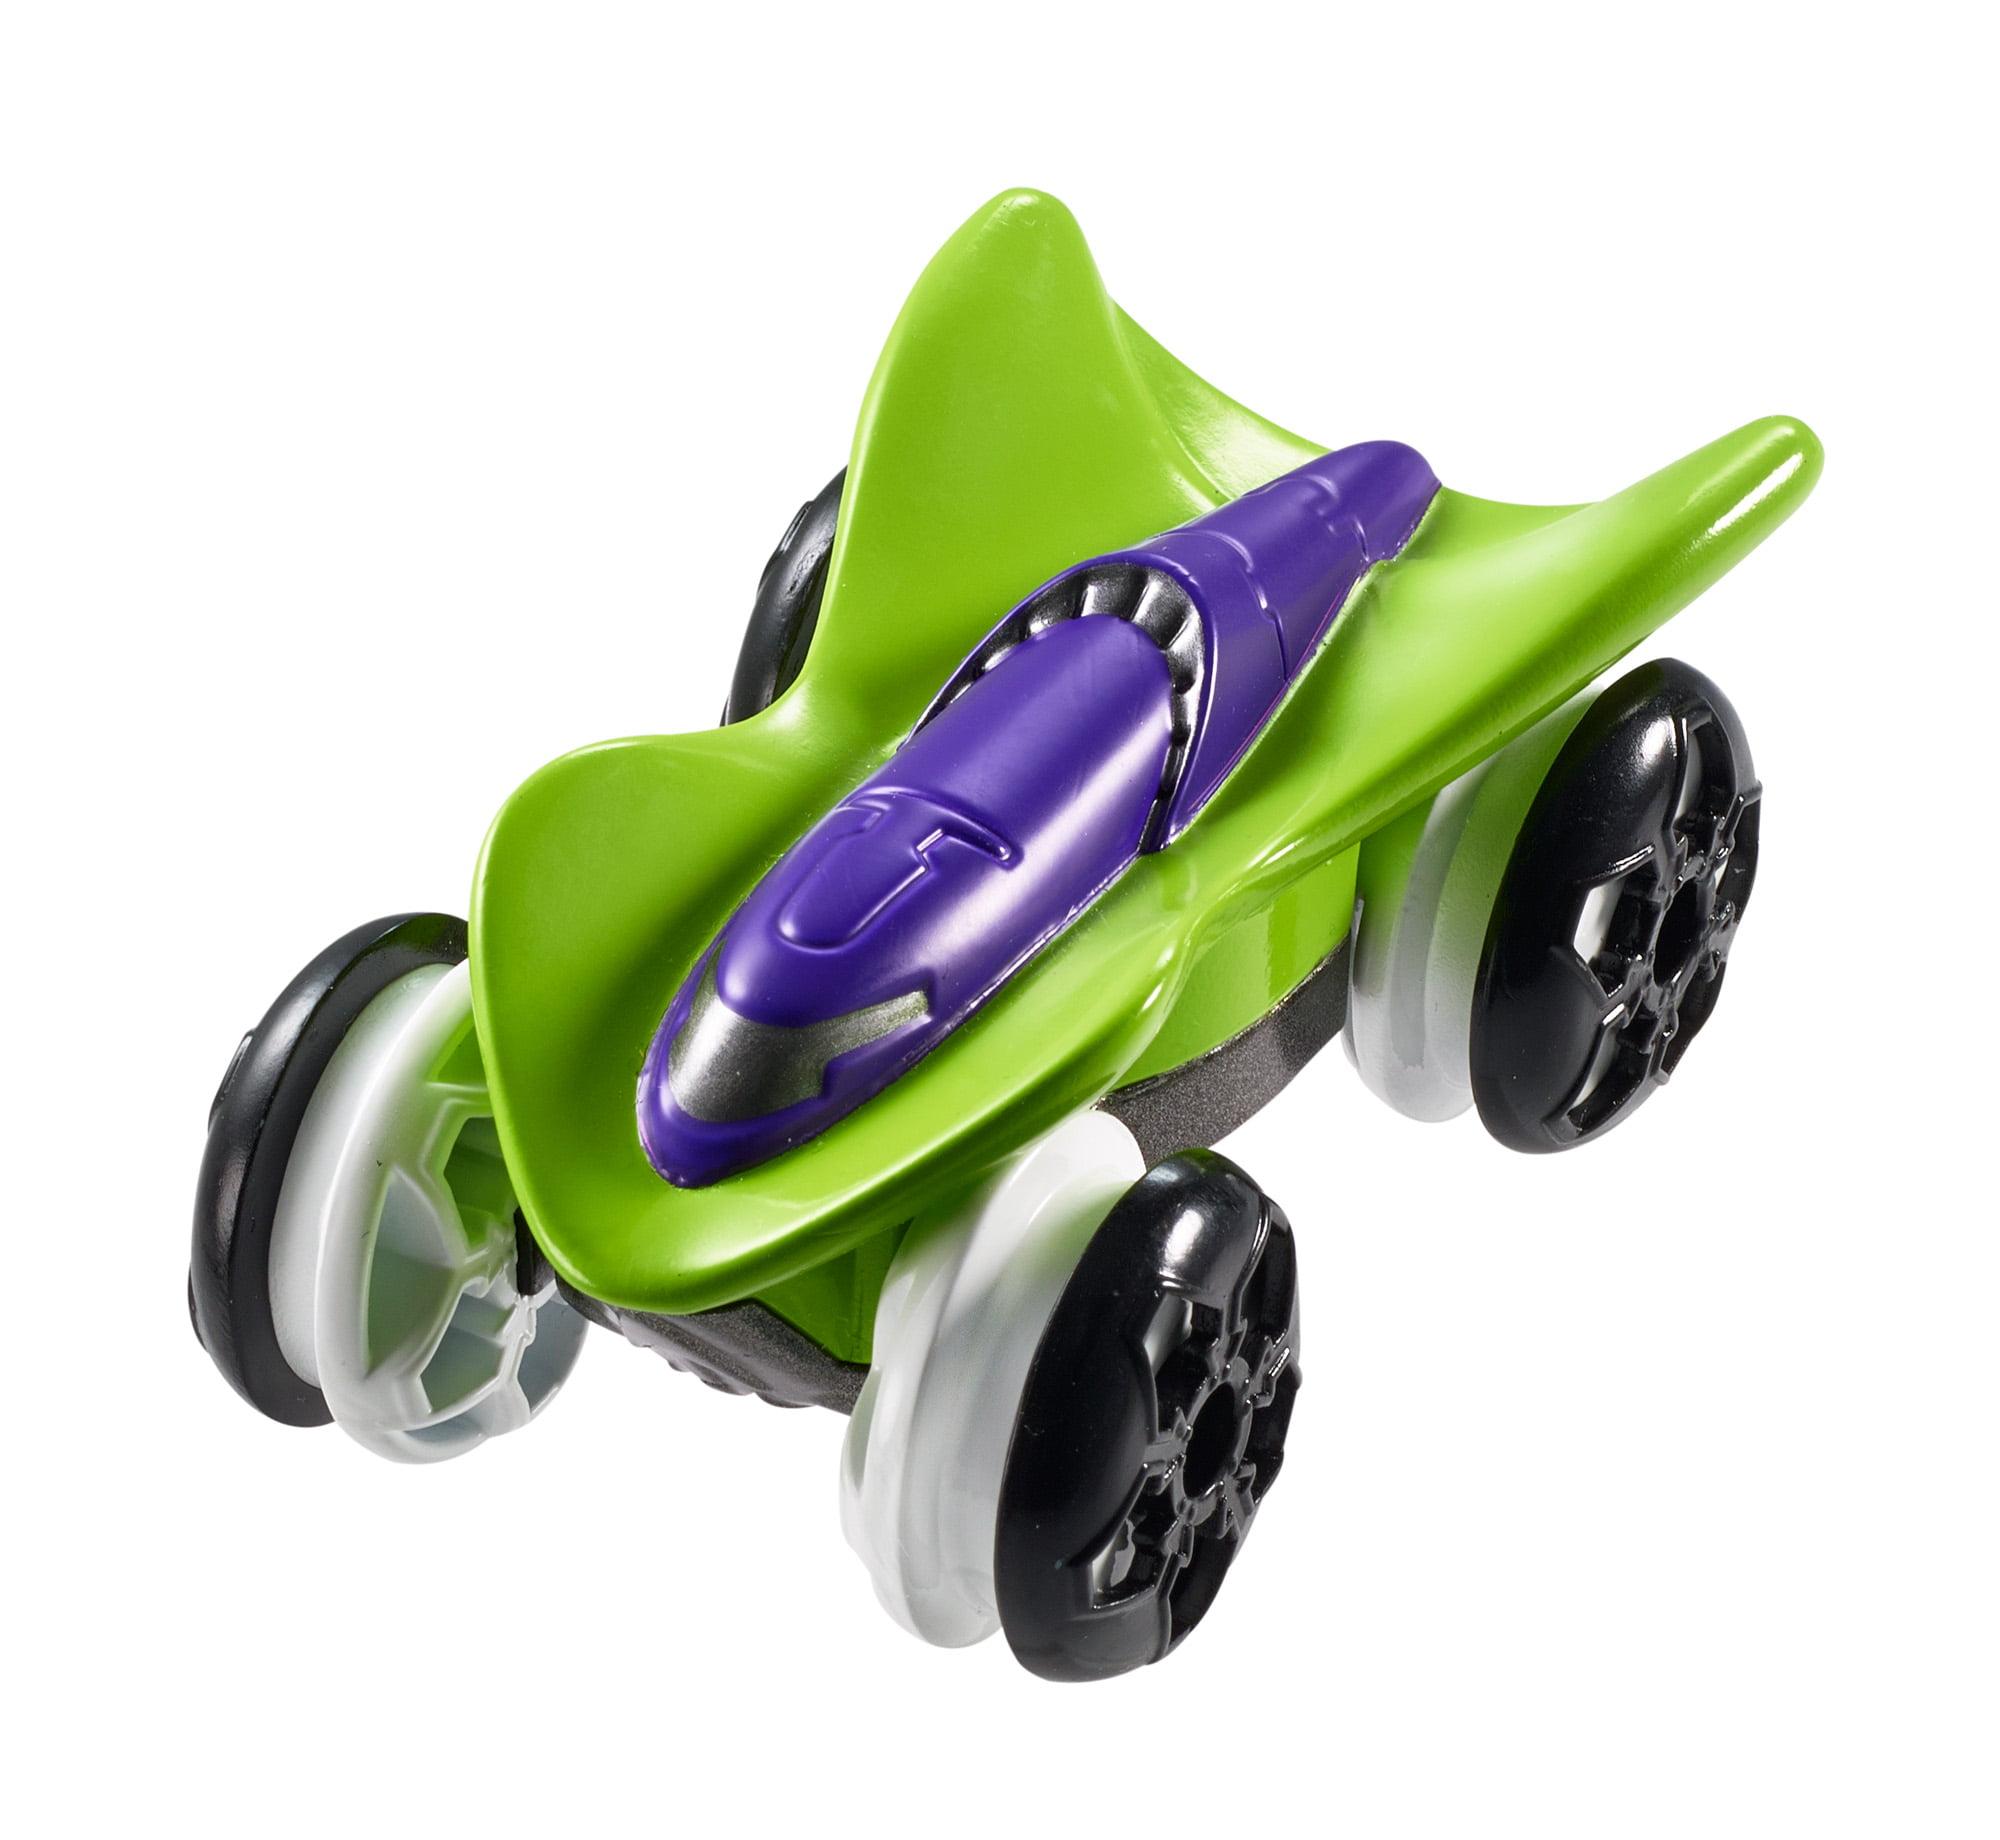 Hot Wheels Splash Fish (Re-Deco) by Mattel